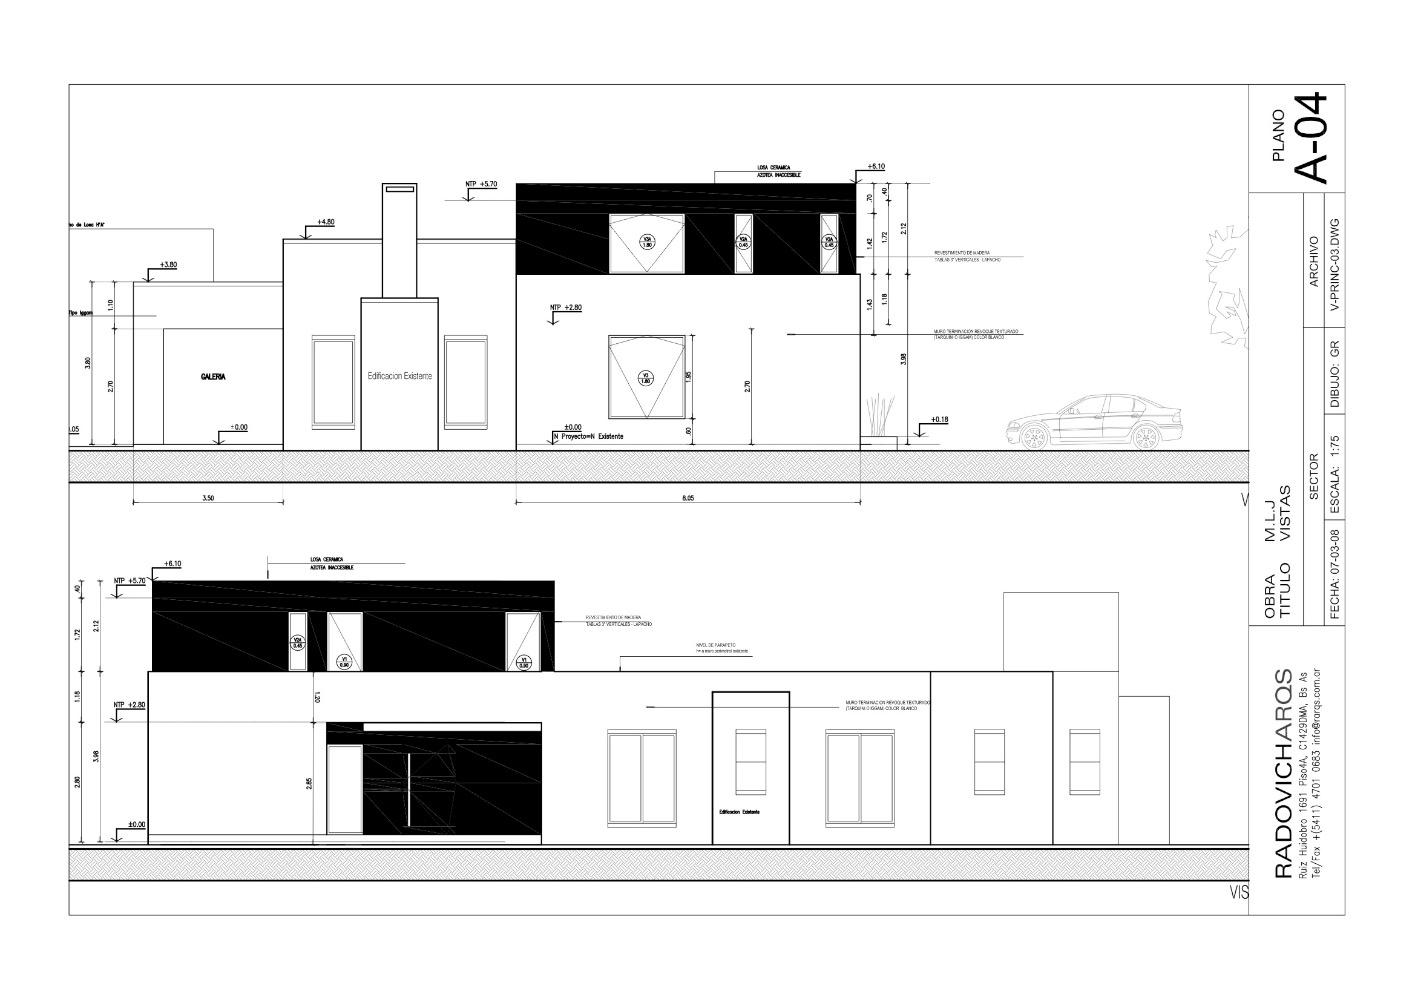 Casa-MLJ, RADOVICHARQS, diseño, arquitectura, decoracion, interiores